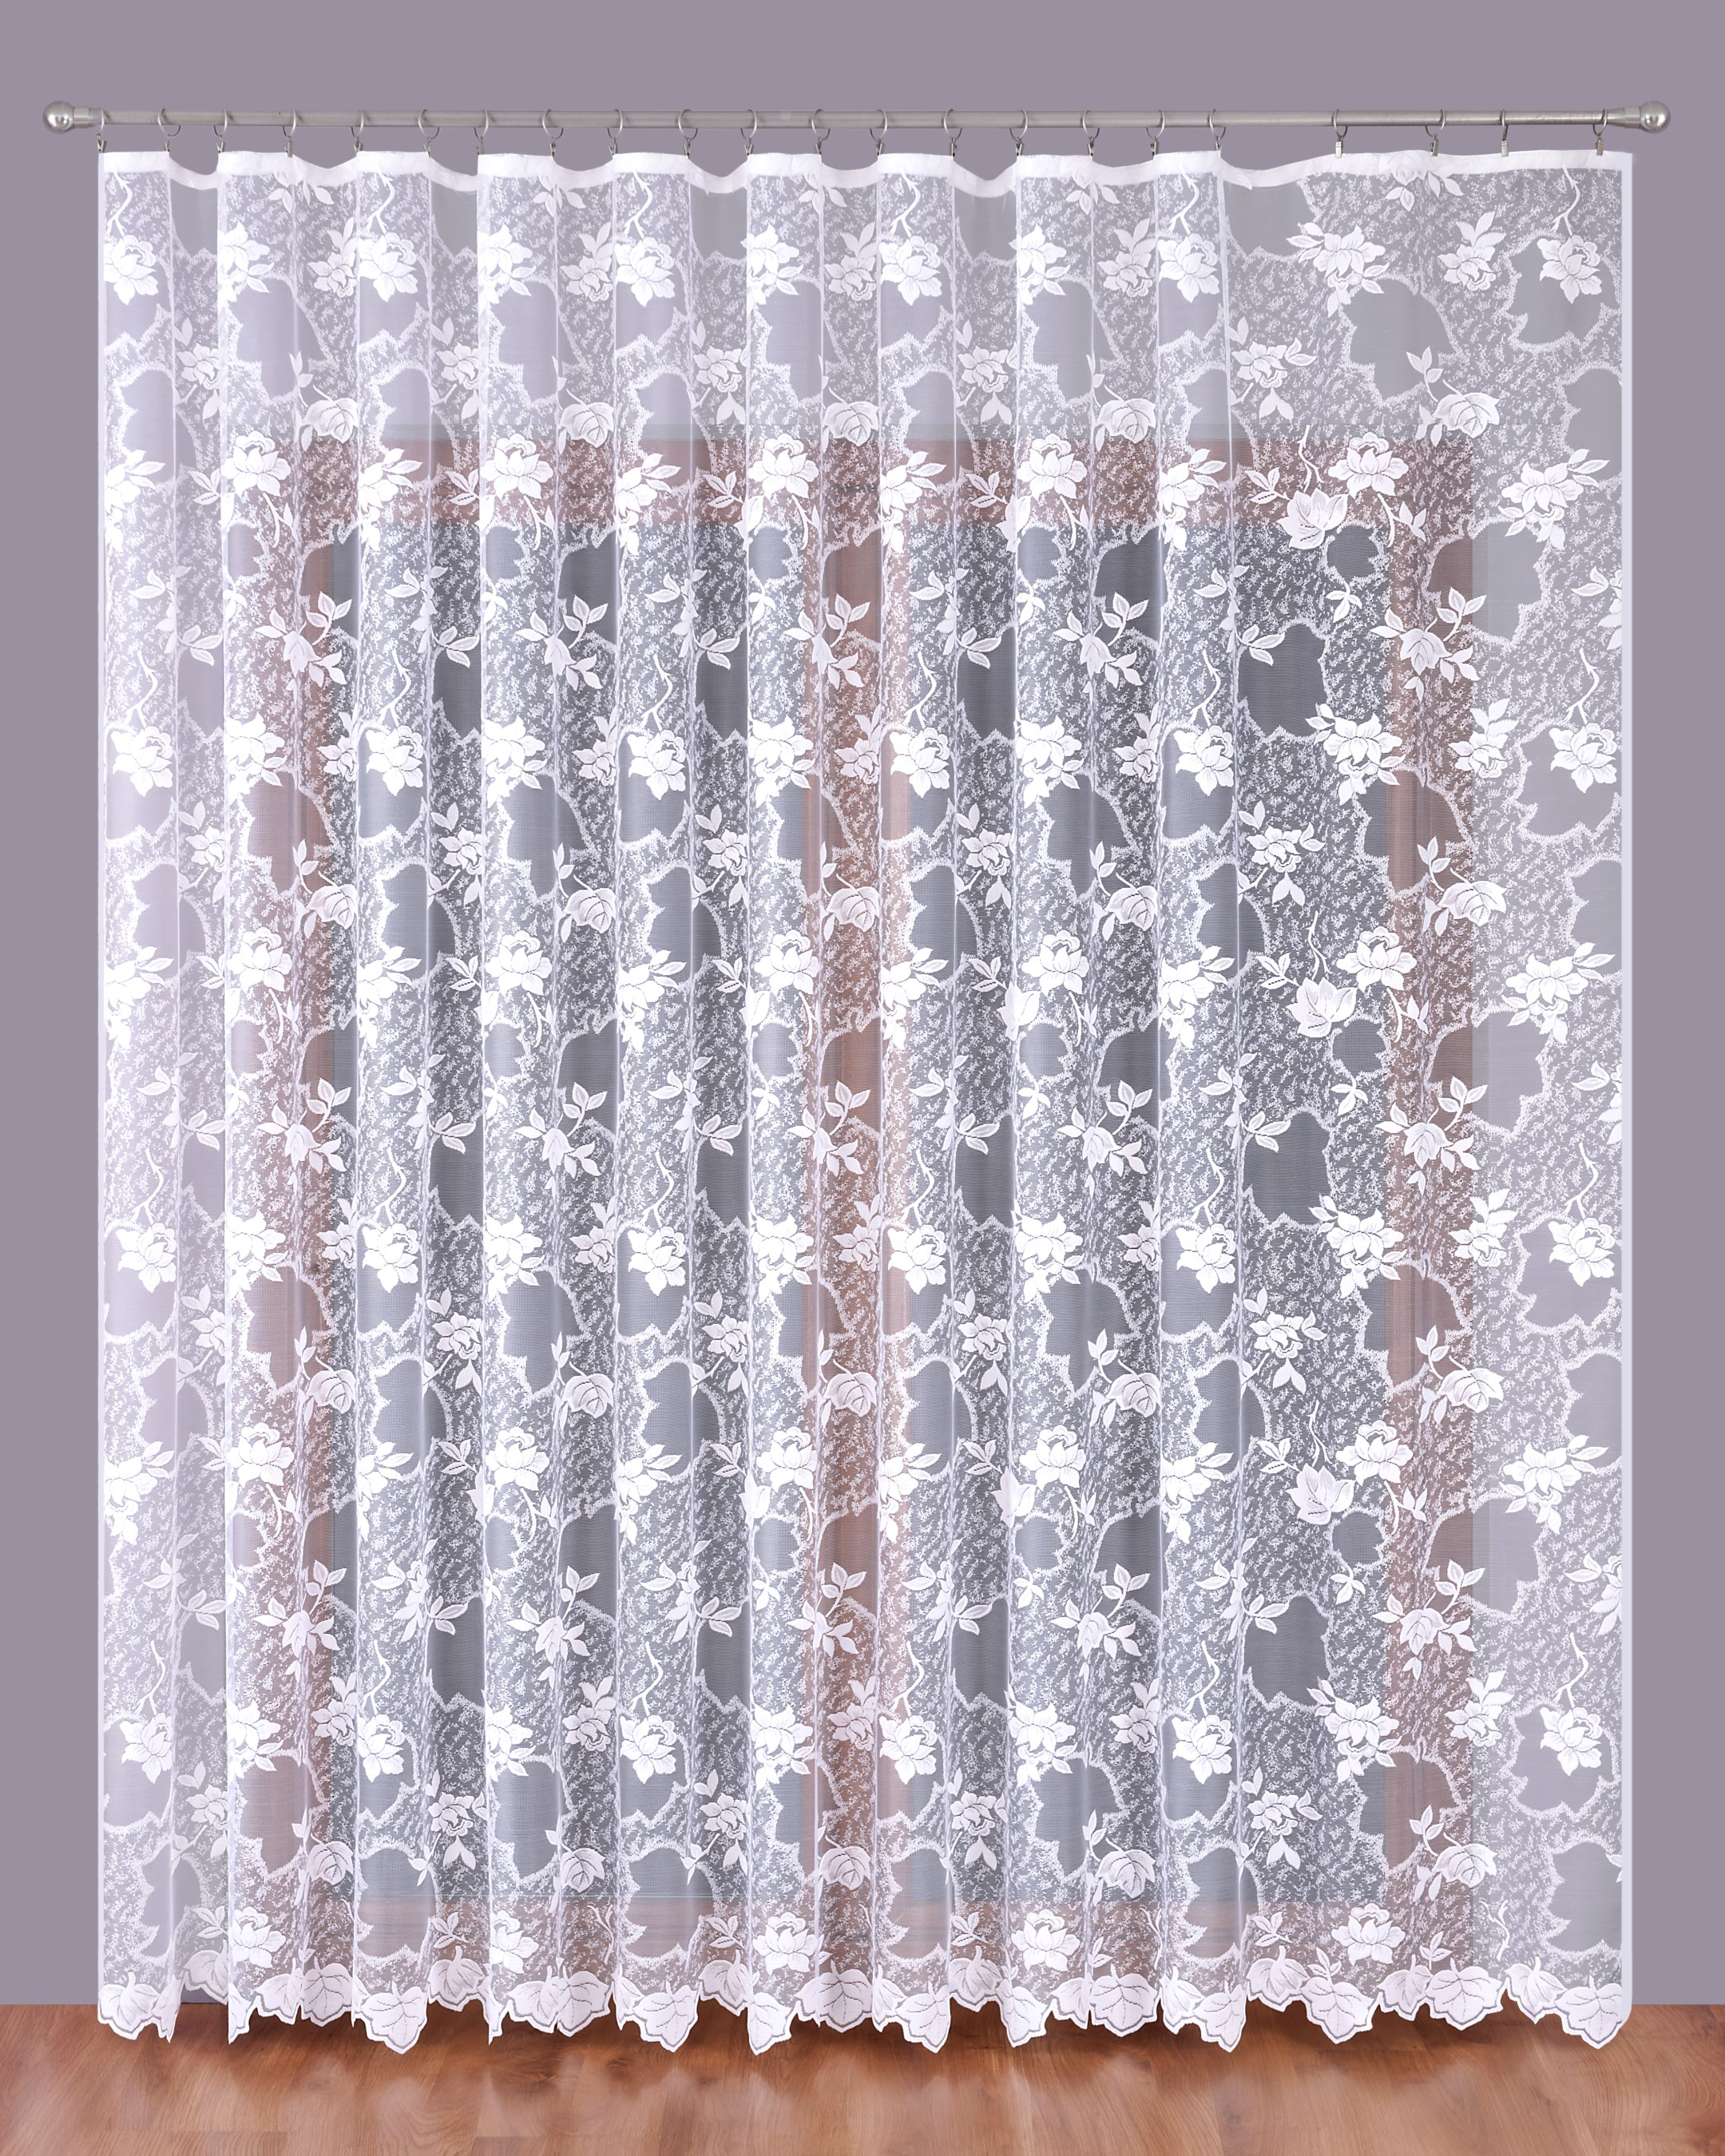 Шторы Primavera Классические шторы Luvinia Цвет: Белый шторы primavera классические шторы maev цвет салатовый